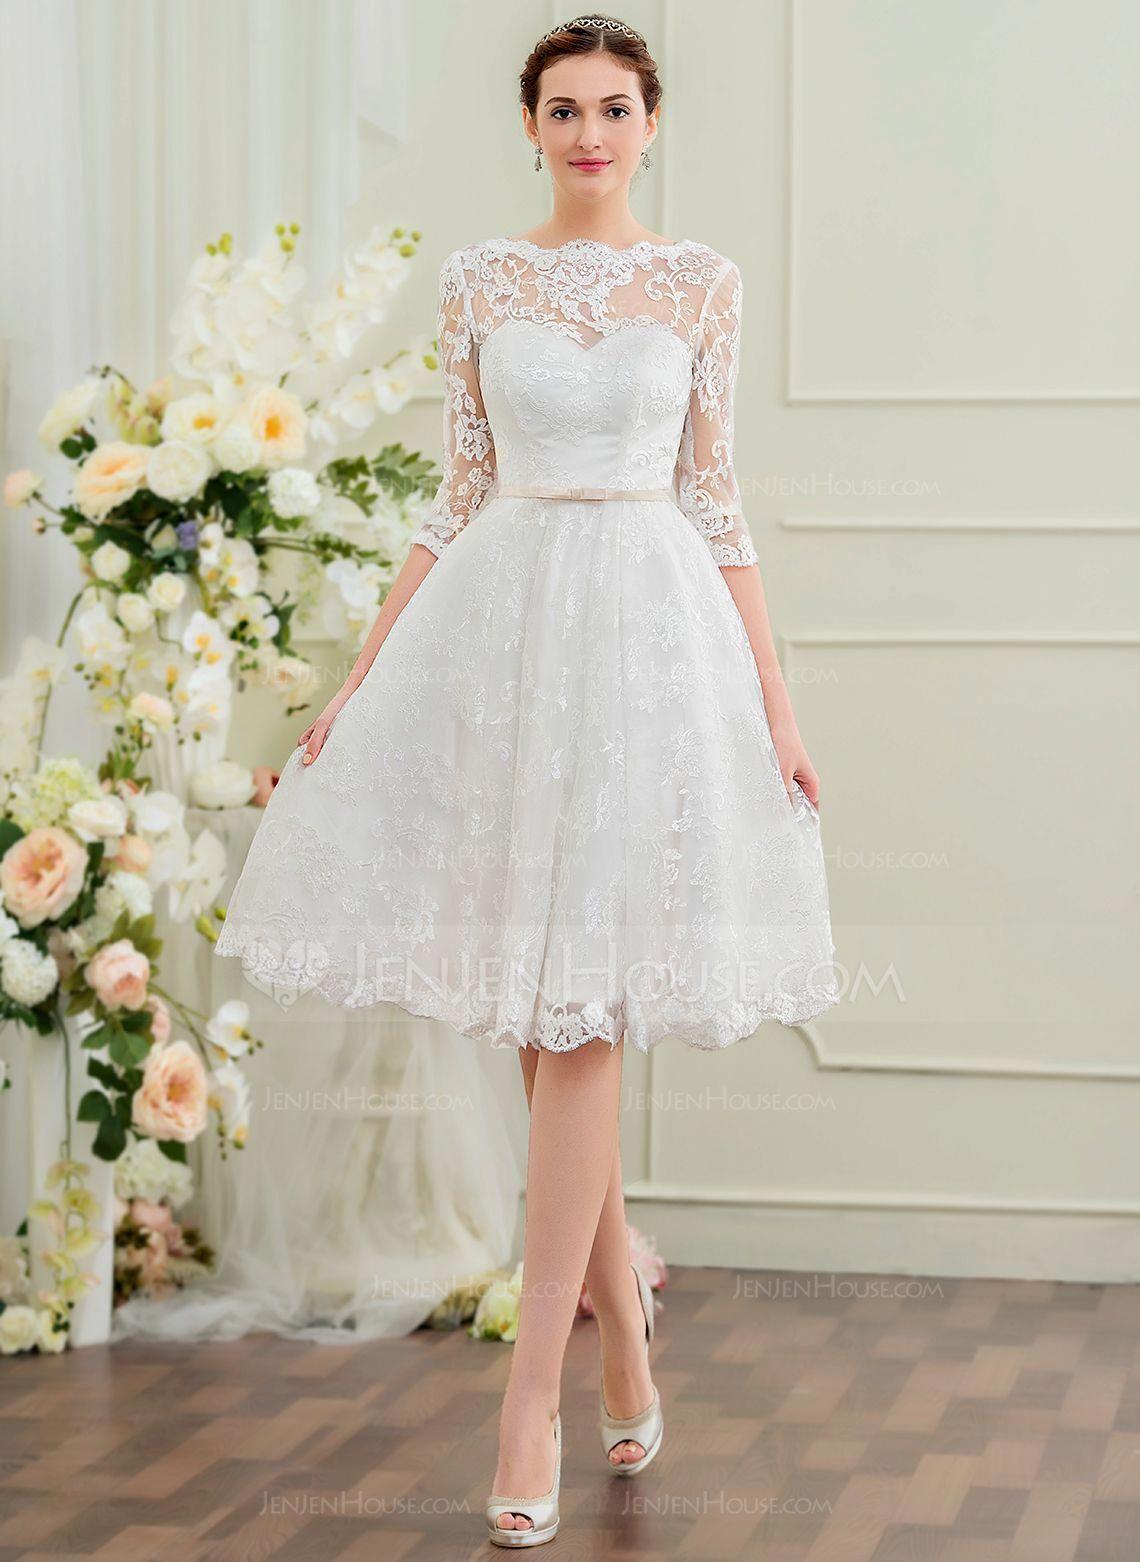 ALine/Princess Scoop Neck KneeLength Lace Wedding Dress